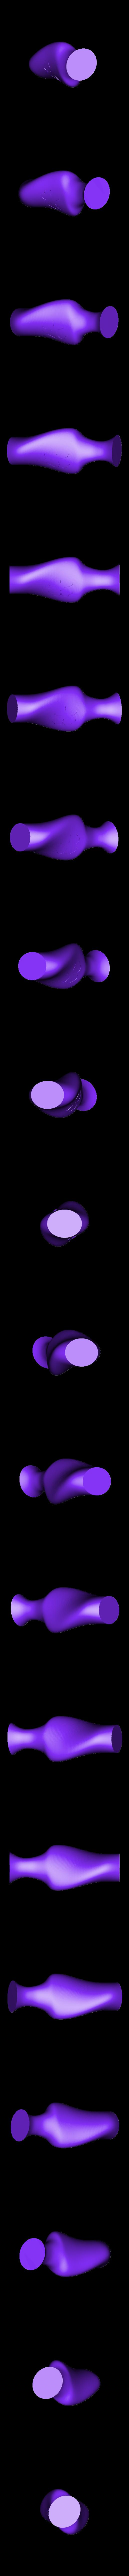 StPat4Leaf.stl Download free STL file St Patty's Clover Vase • 3D printing object, Thomllama